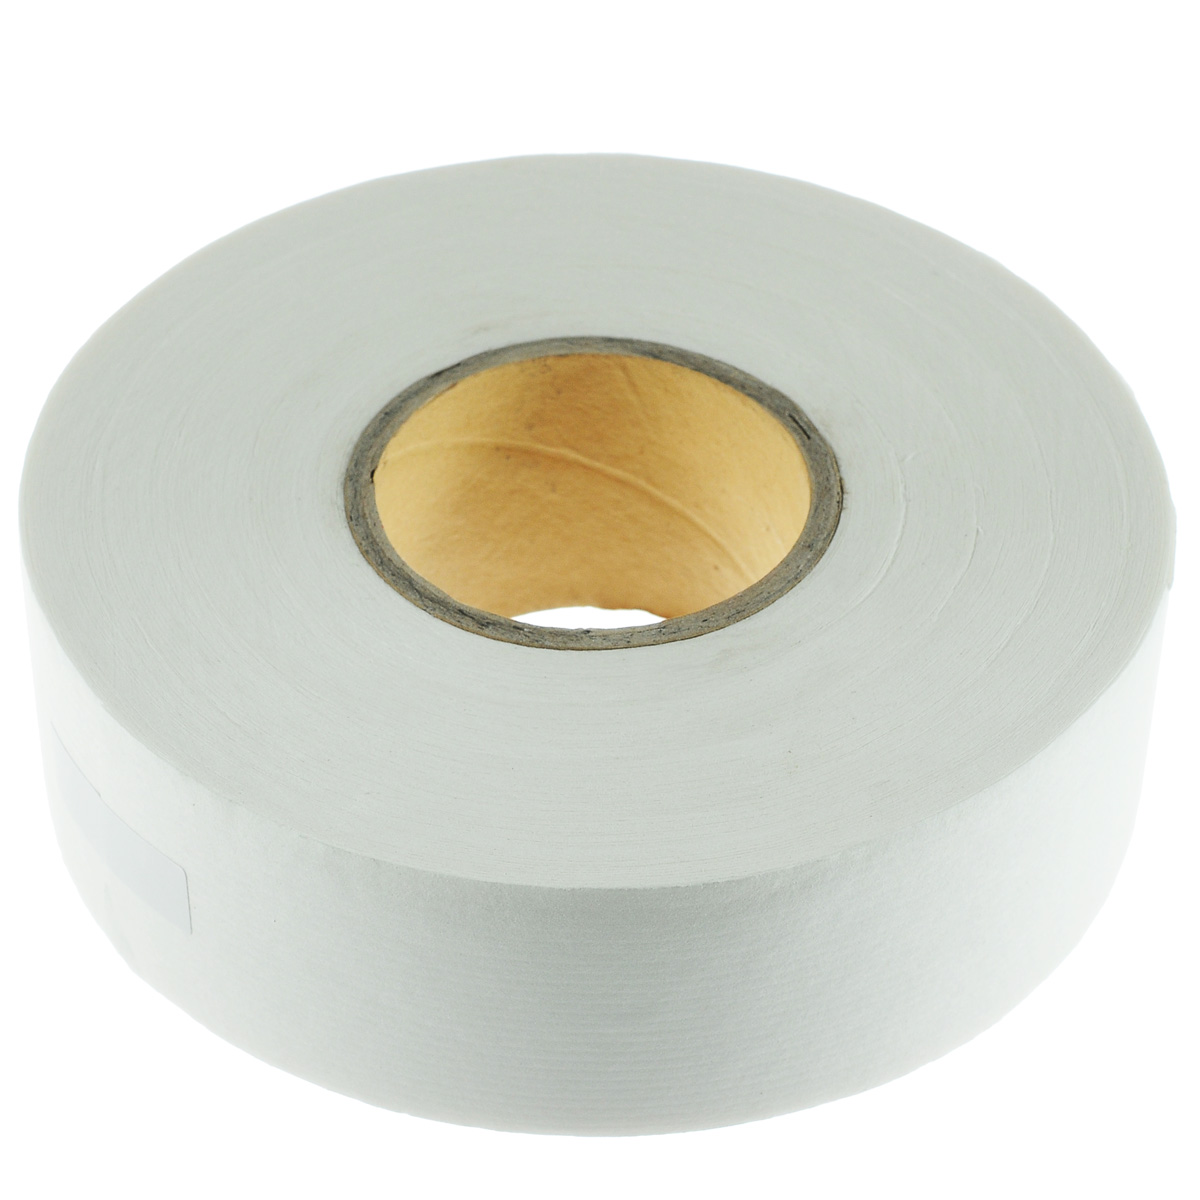 Лента клеевая Prym Паутинка, цвет: белый, ширина 4 см, длина 50 м лента эластичная prym прочная цвет белый ширина 3 см длина 10 м